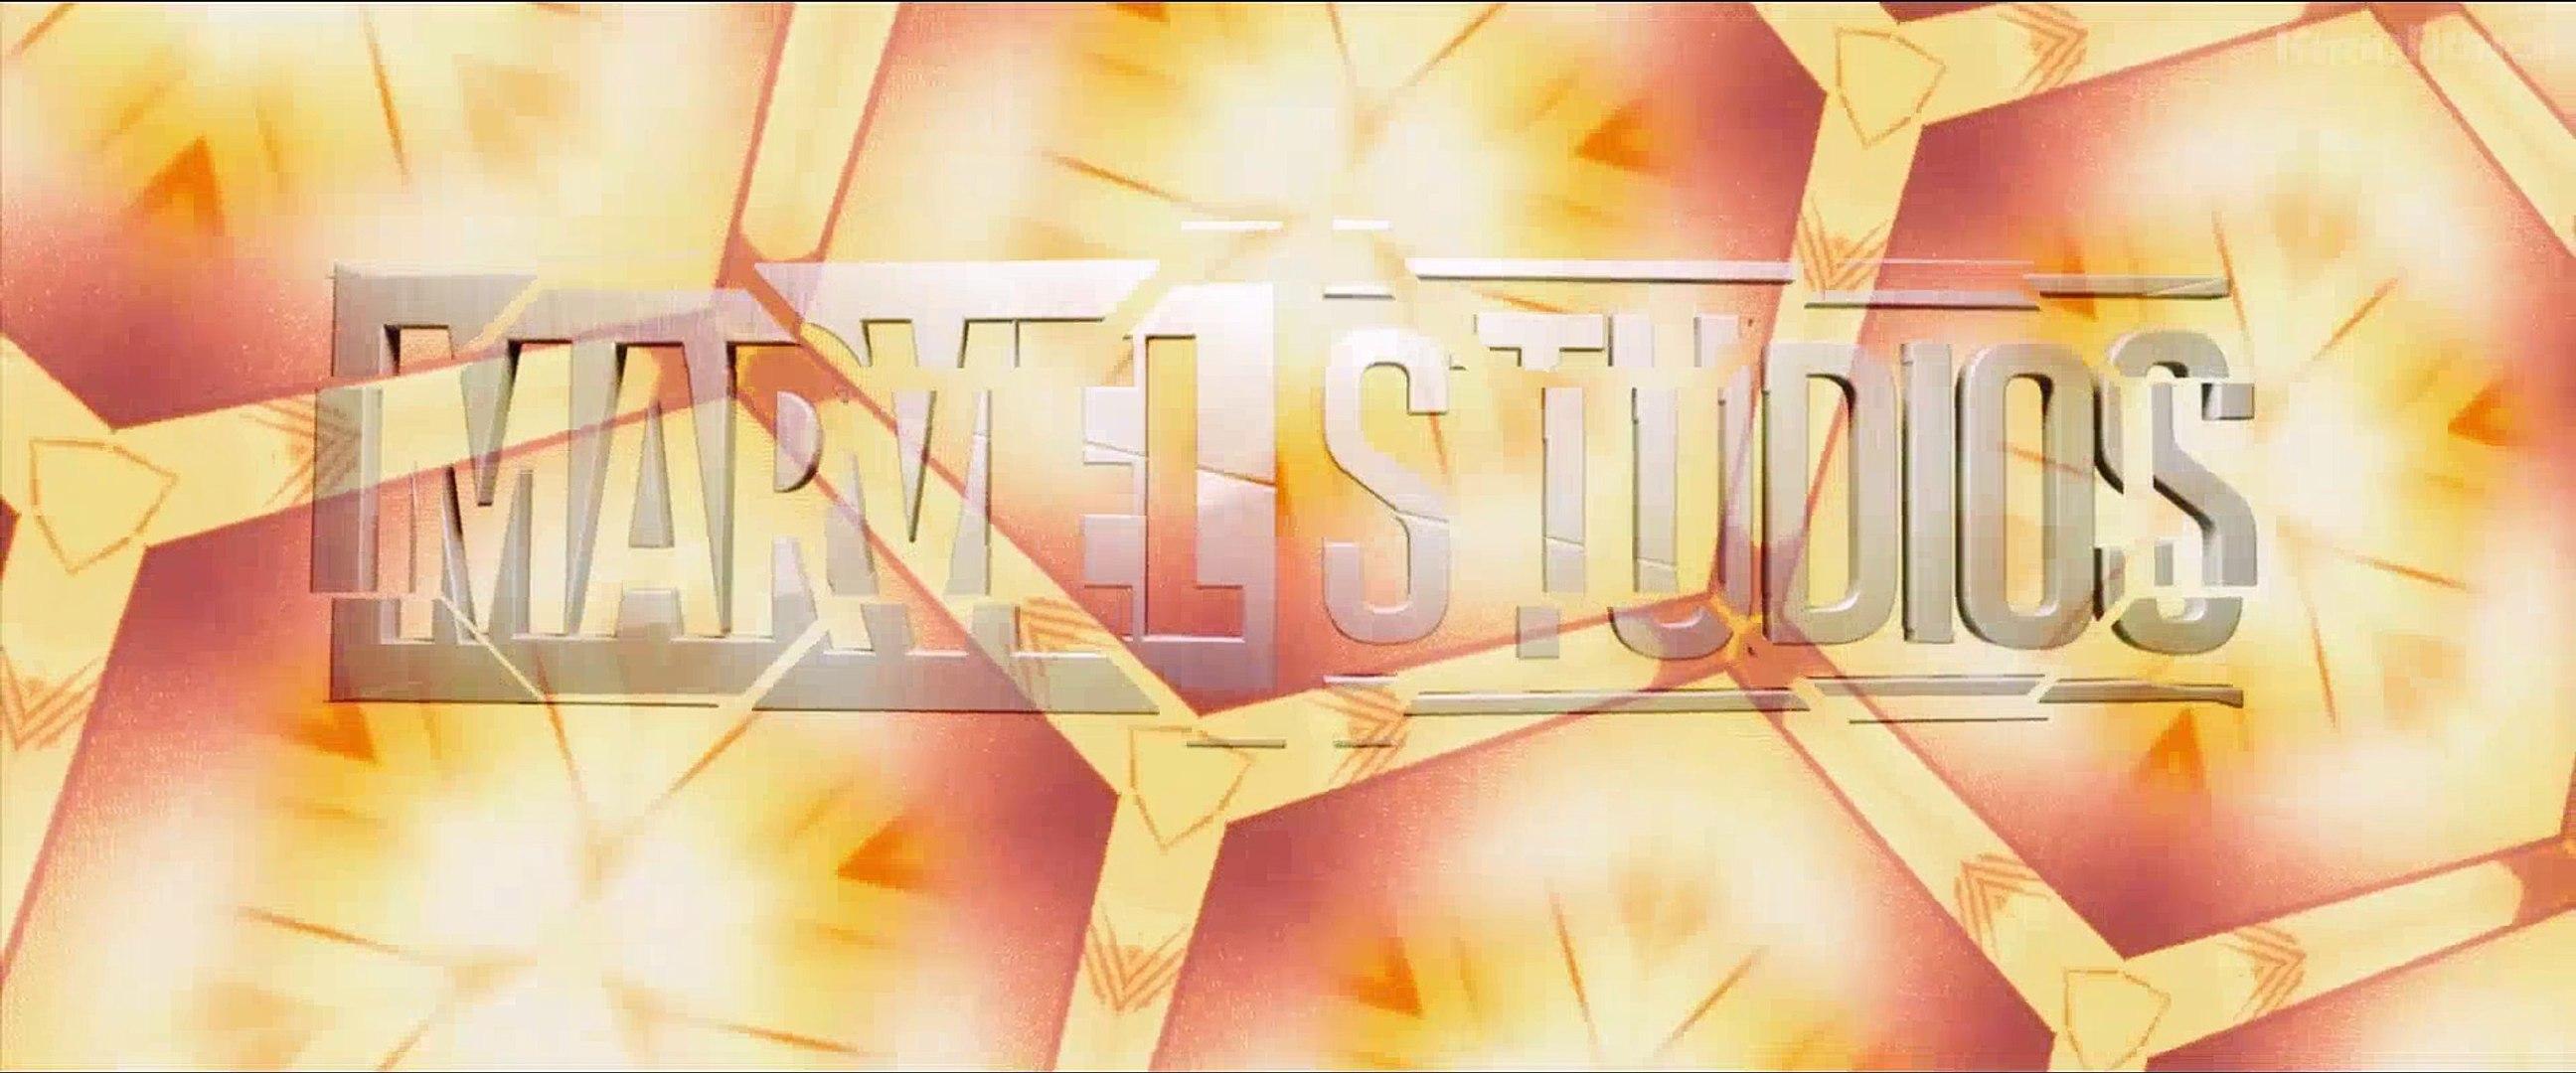 Доктор Стрэндж / Doctor Strange (2016) русский трейлер